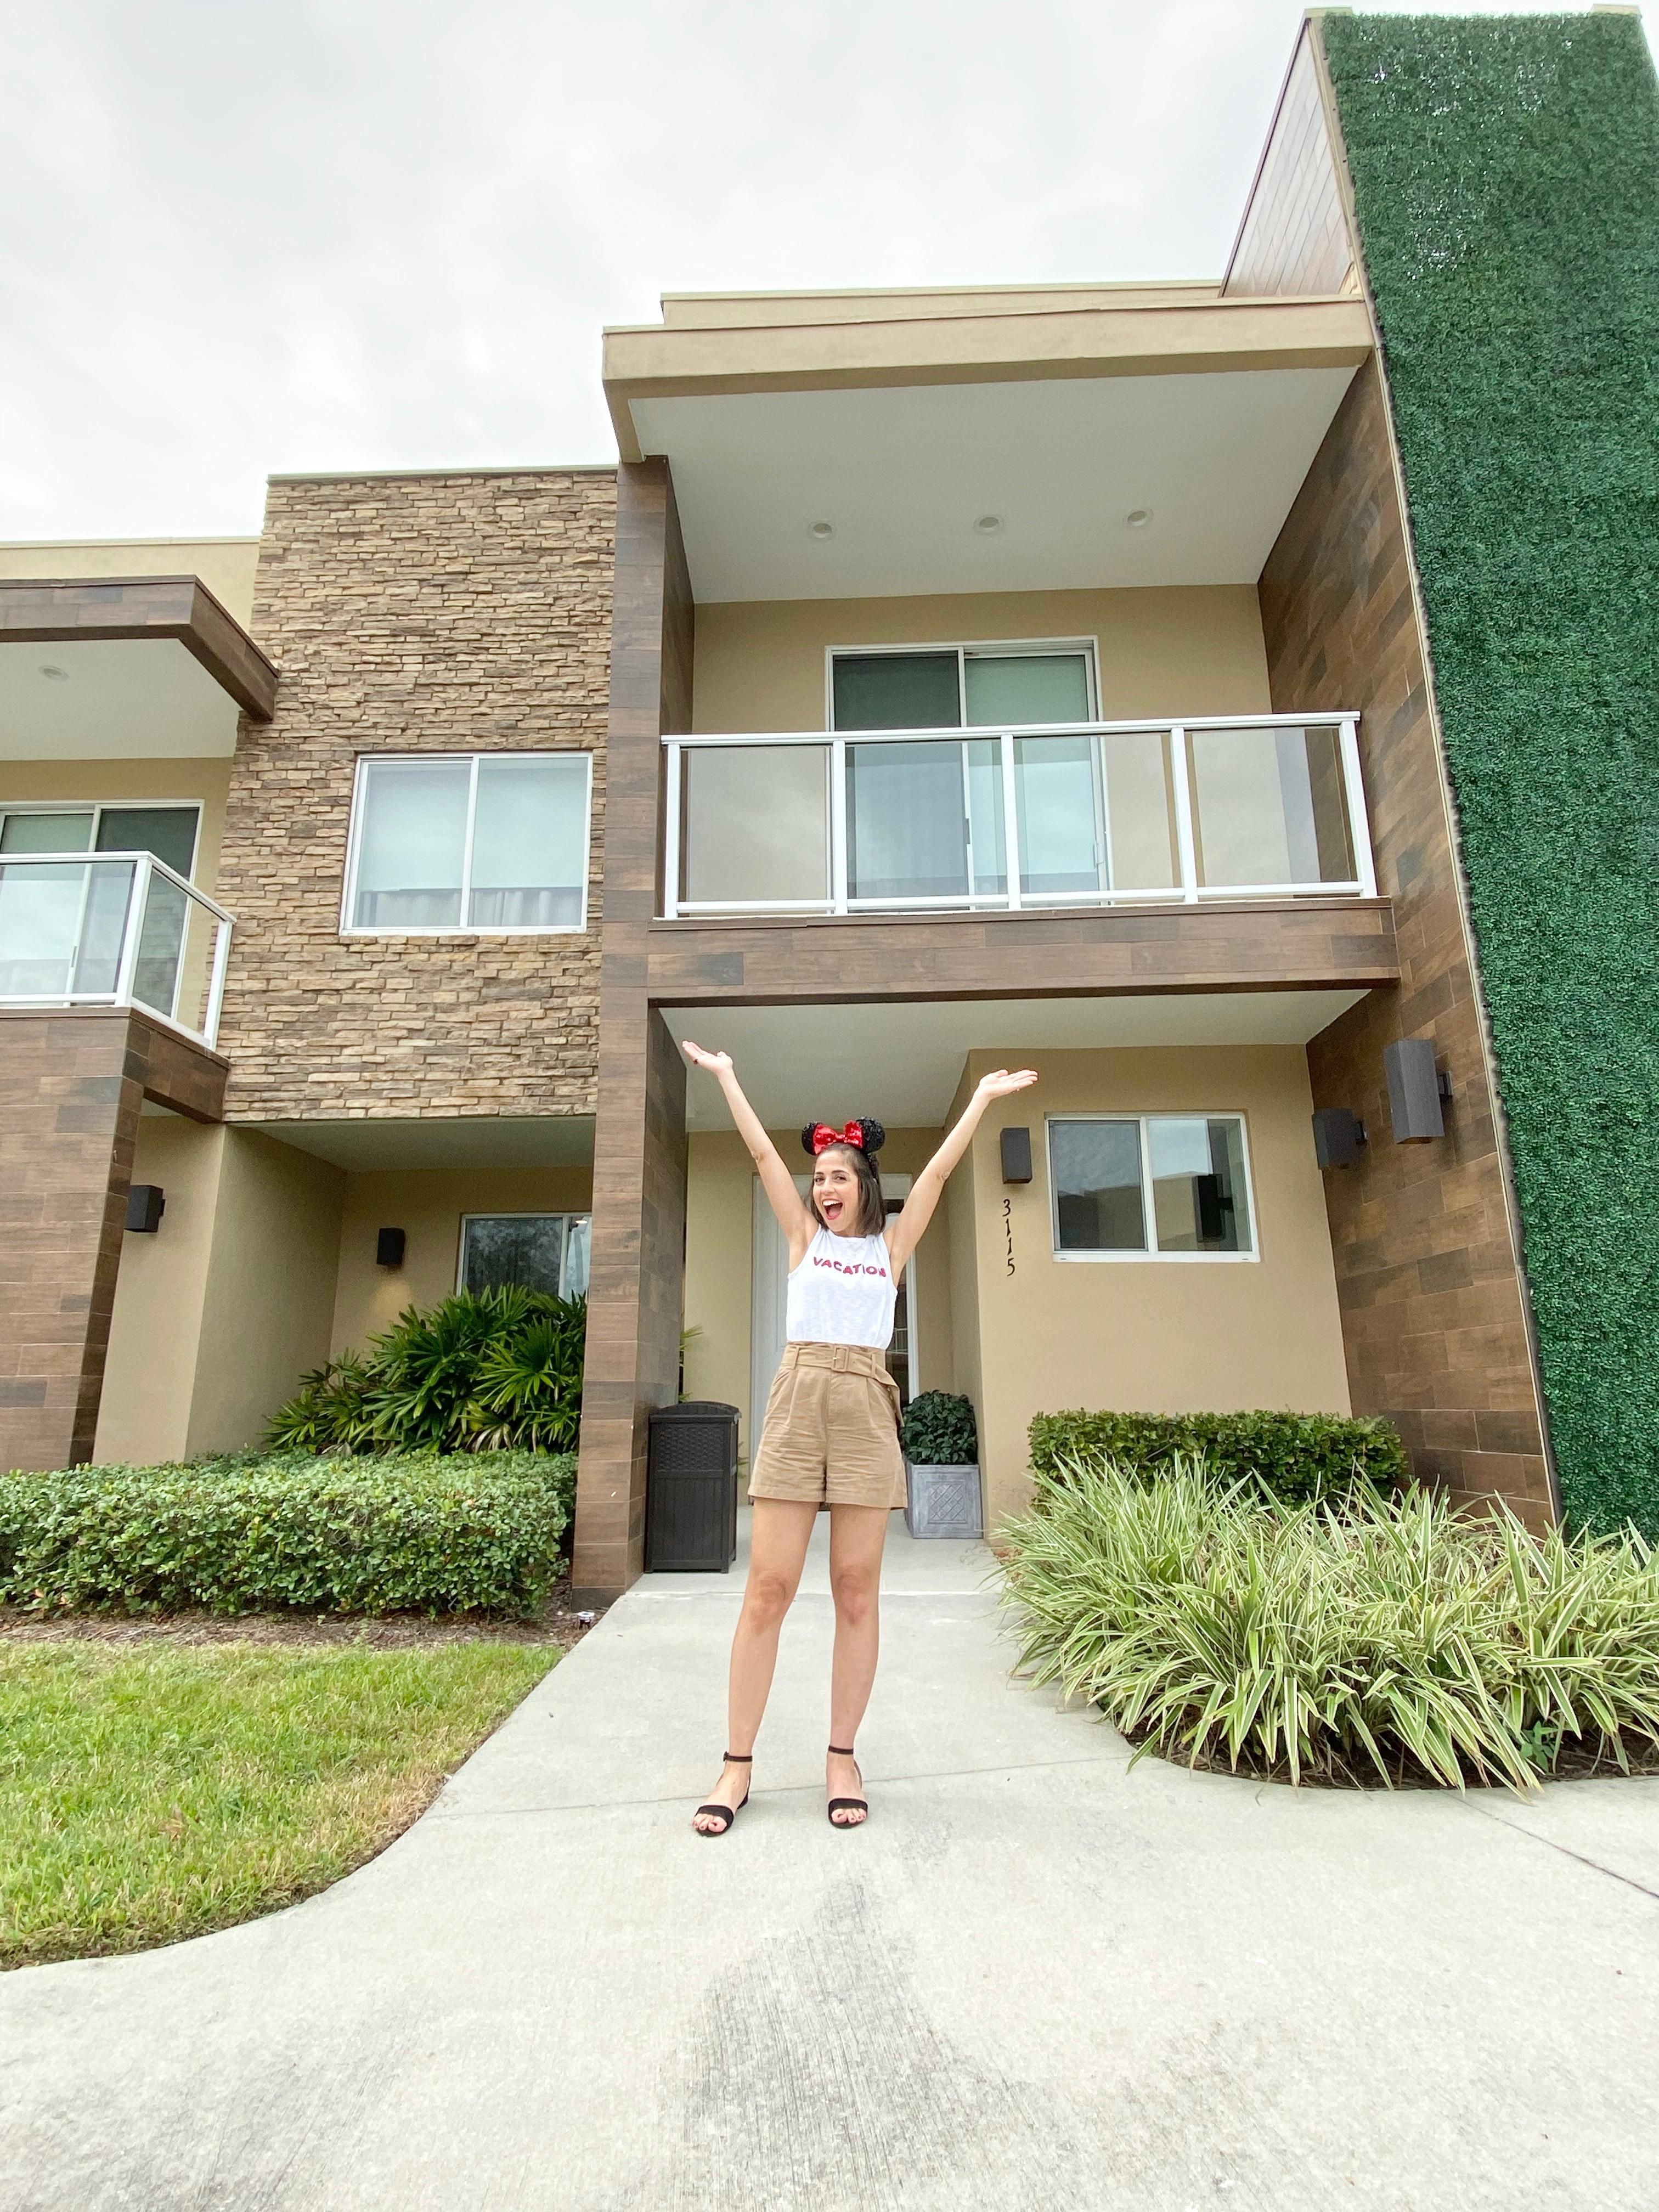 Magic Village Yards: A Home Away From Home Near Disney Miami Moms Blog Becky Salgado Contributor